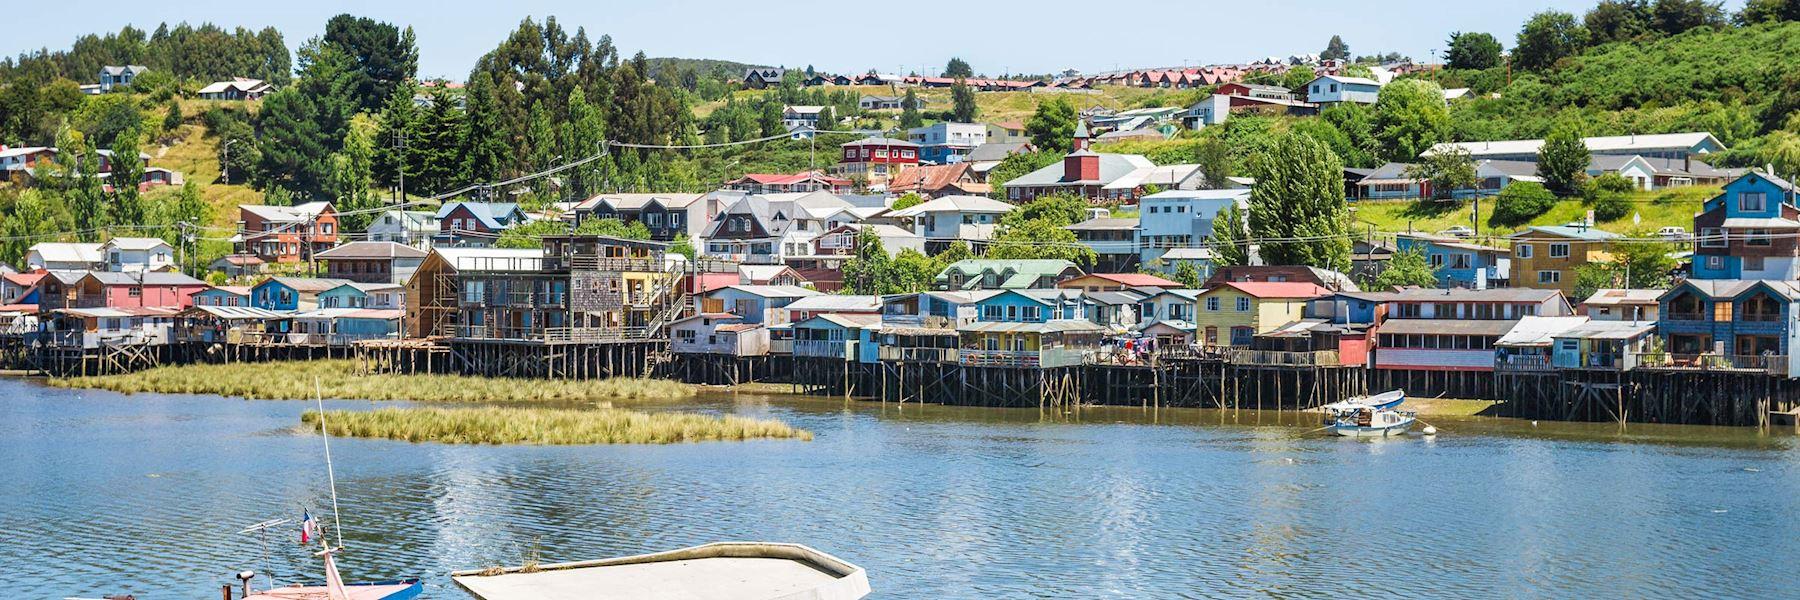 Visit Chiloé Island, Chile